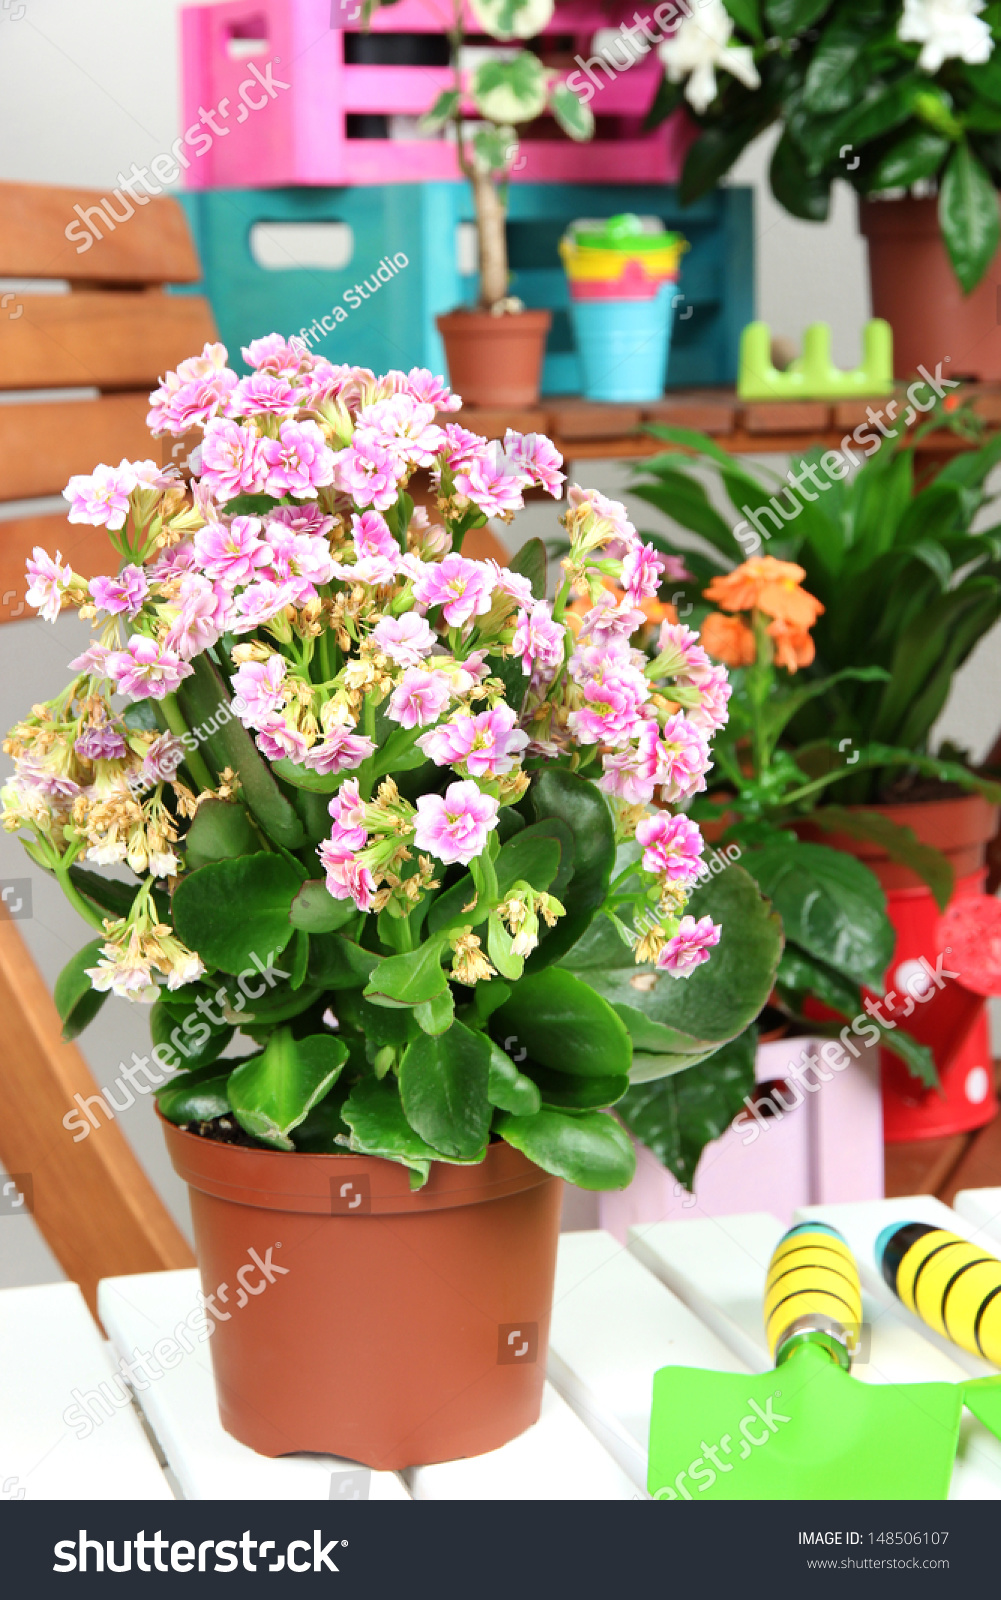 Many Beautiful Flowers Pots Room Closeup Stock Photo Royalty Free